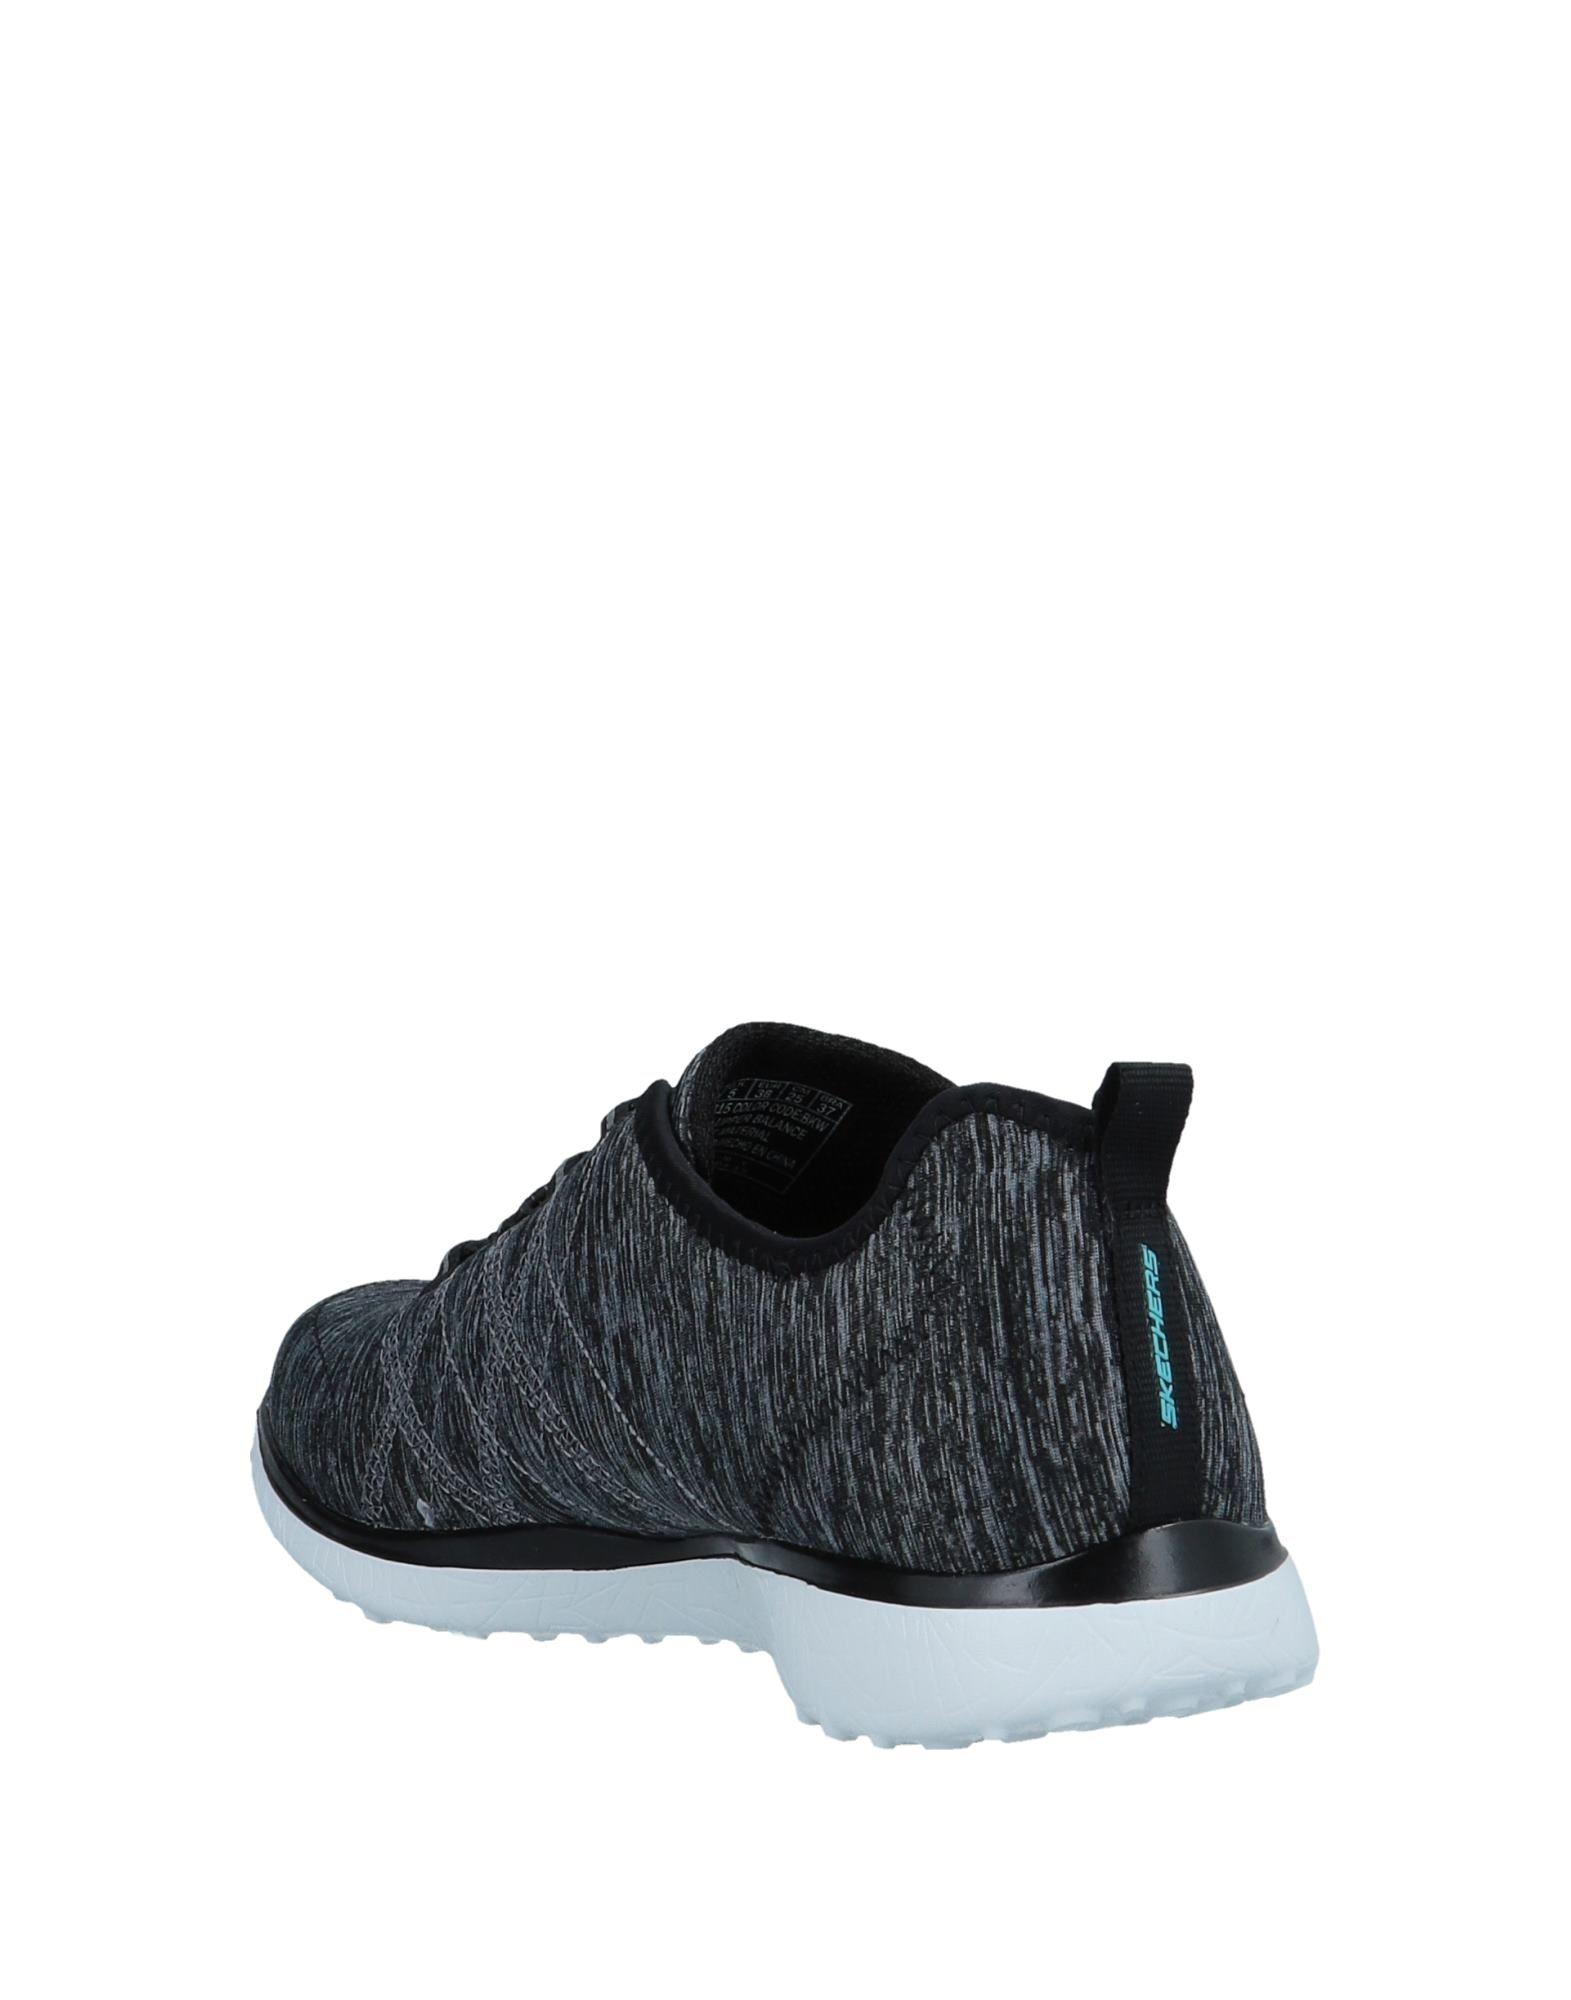 Skechers Sneakers Damen Damen Sneakers  11554743WA  0d5595